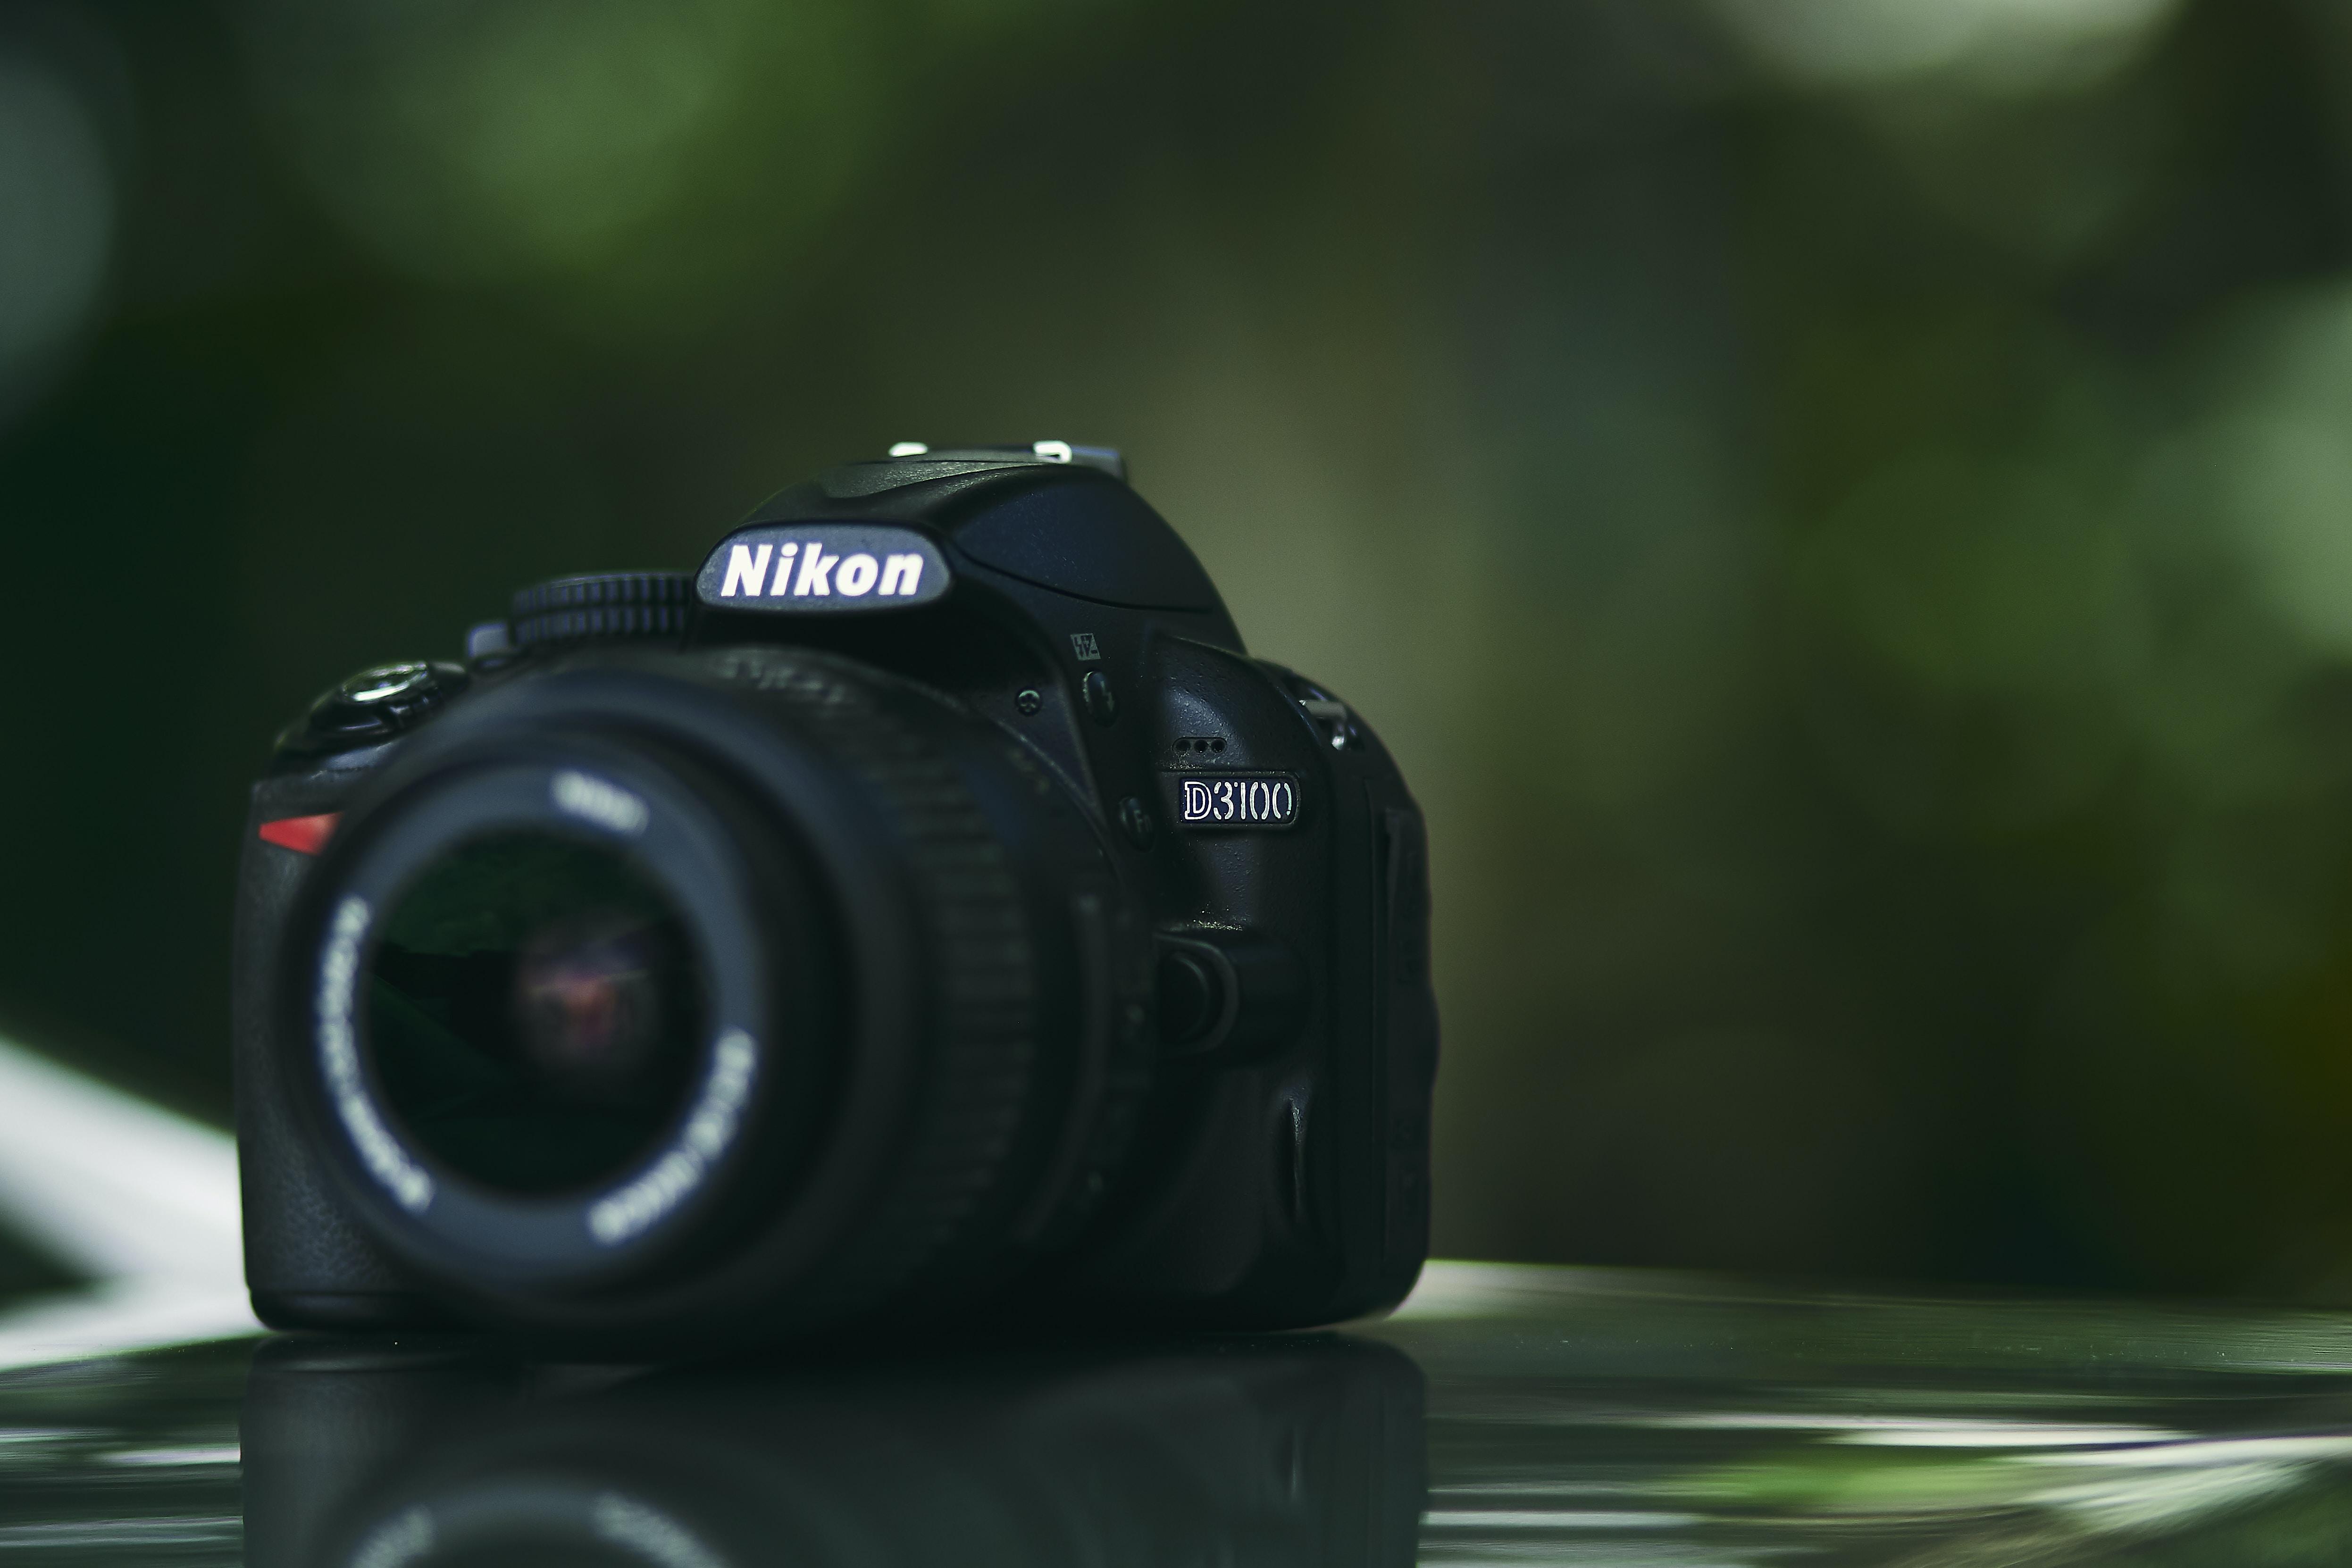 photo of Nikon D300 camera